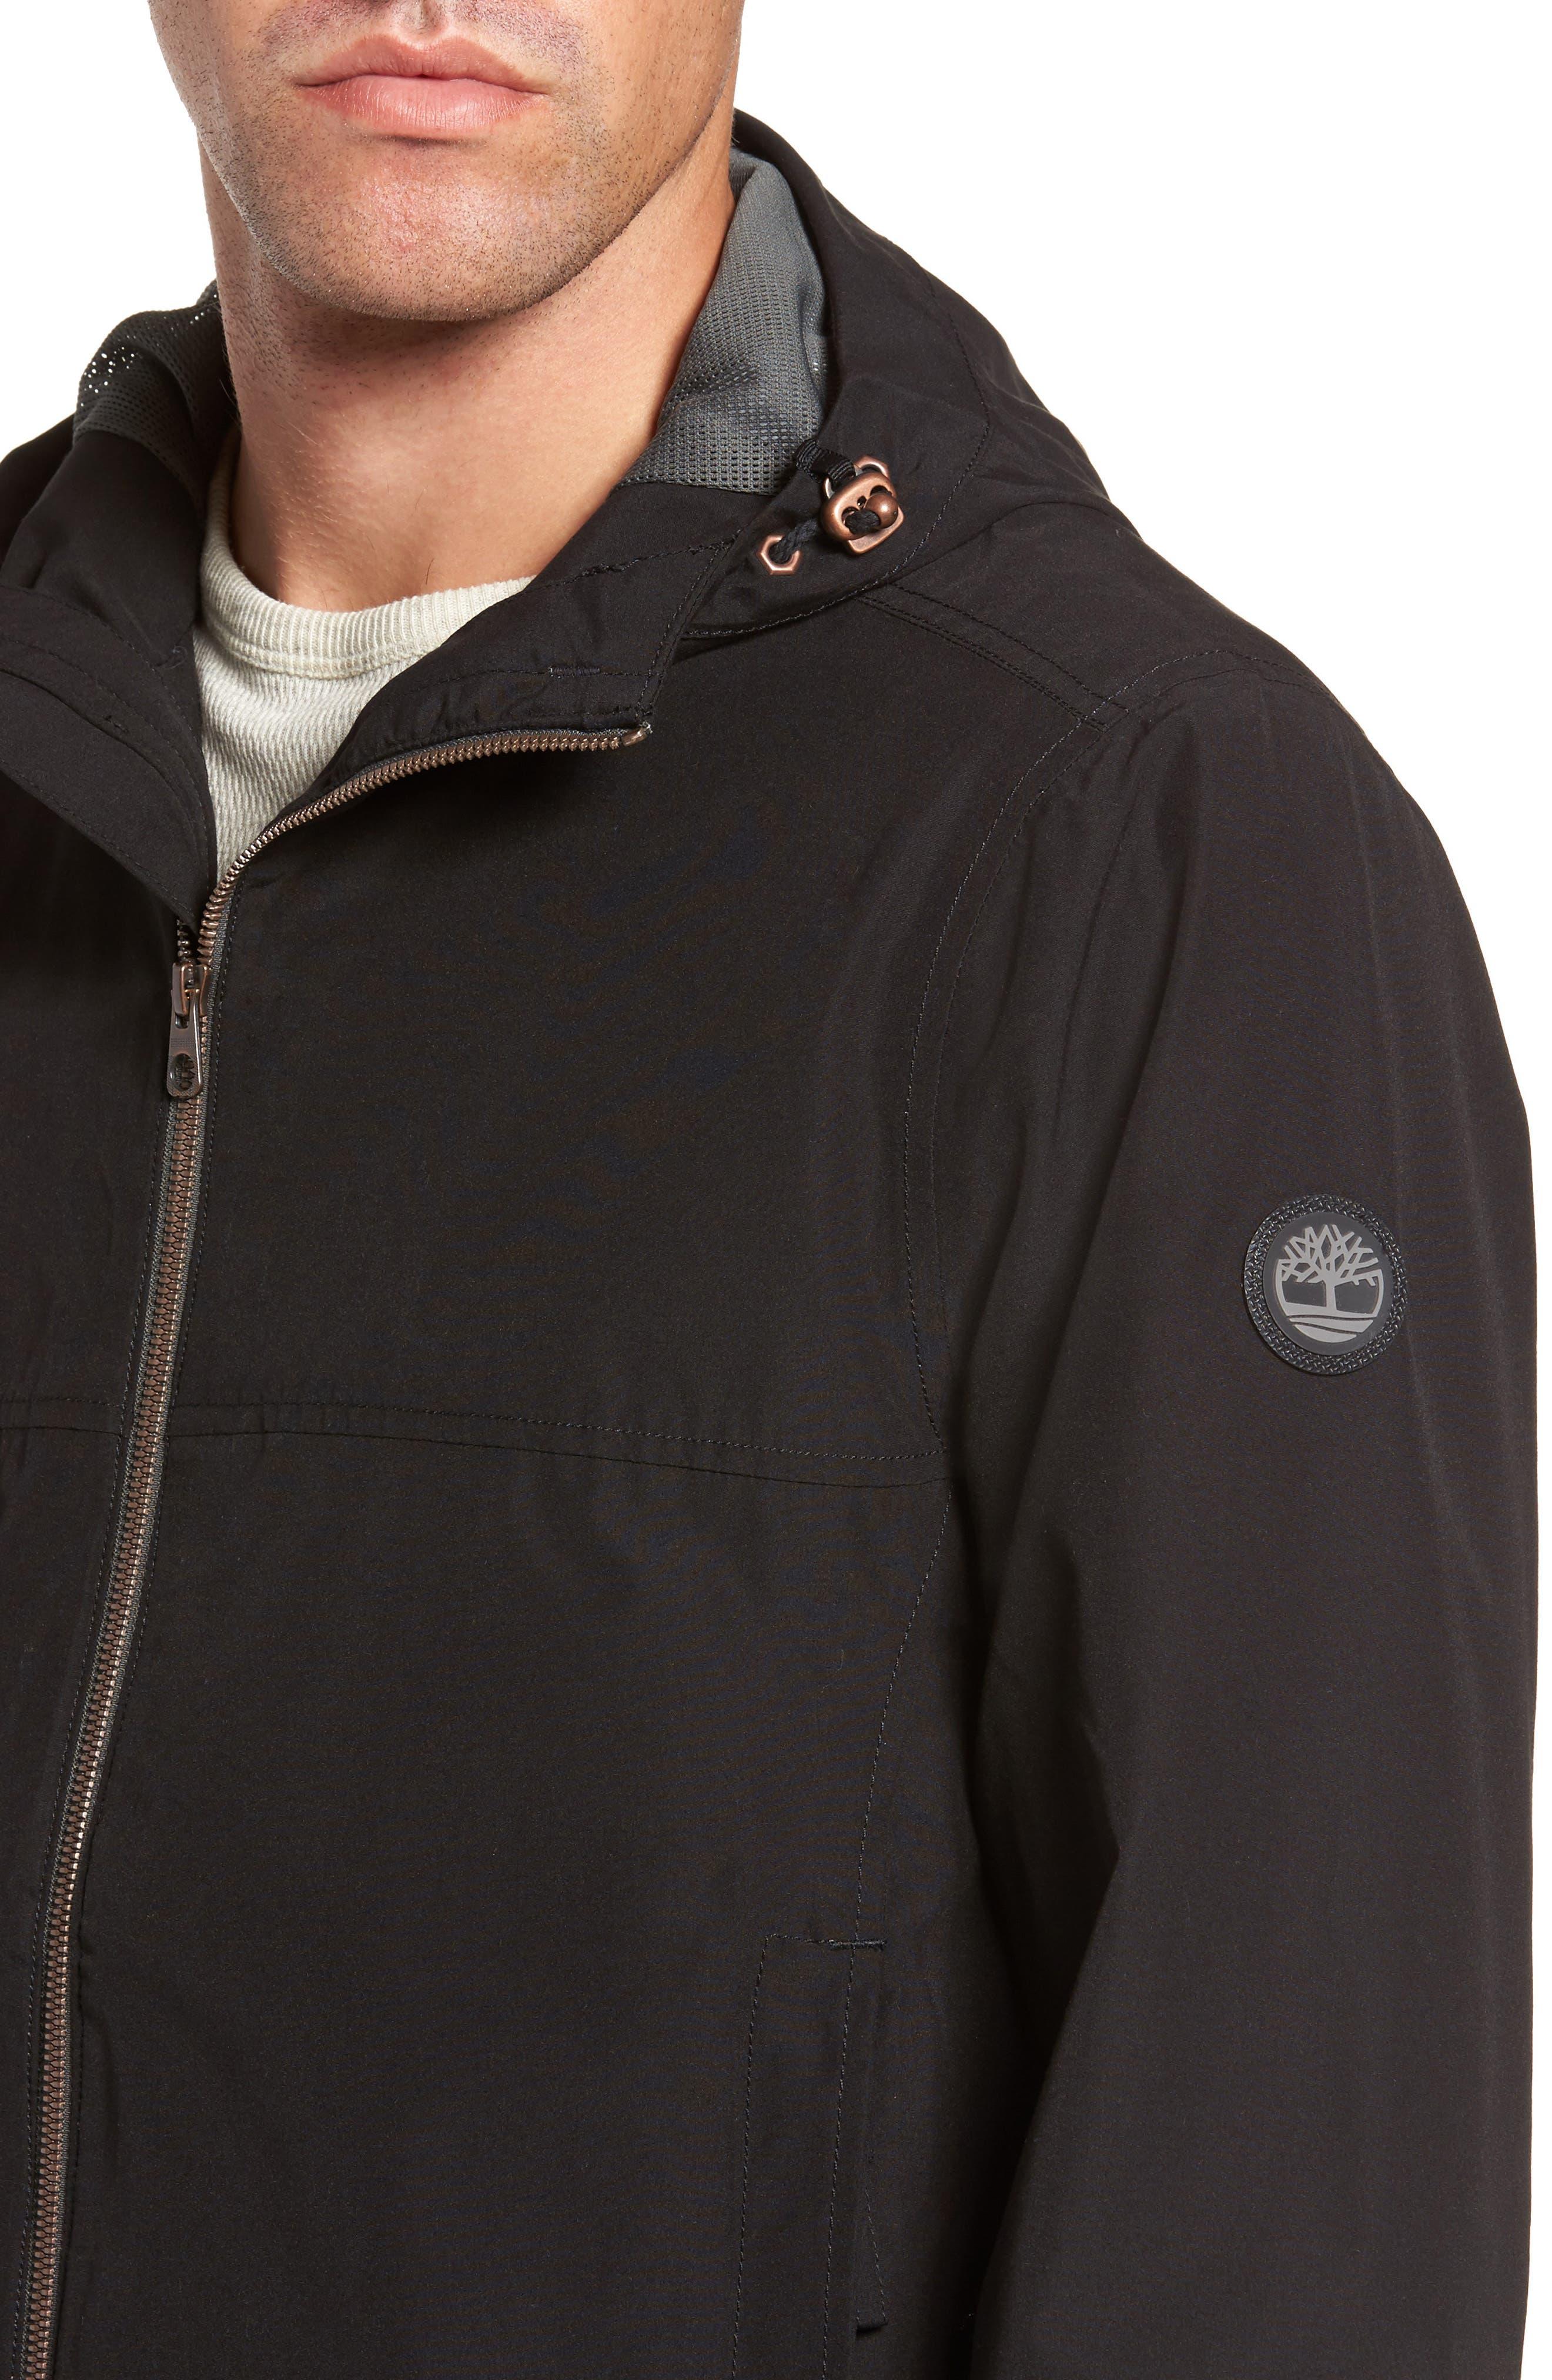 Ragged Mountain Packable Waterproof Jacket,                             Alternate thumbnail 4, color,                             001